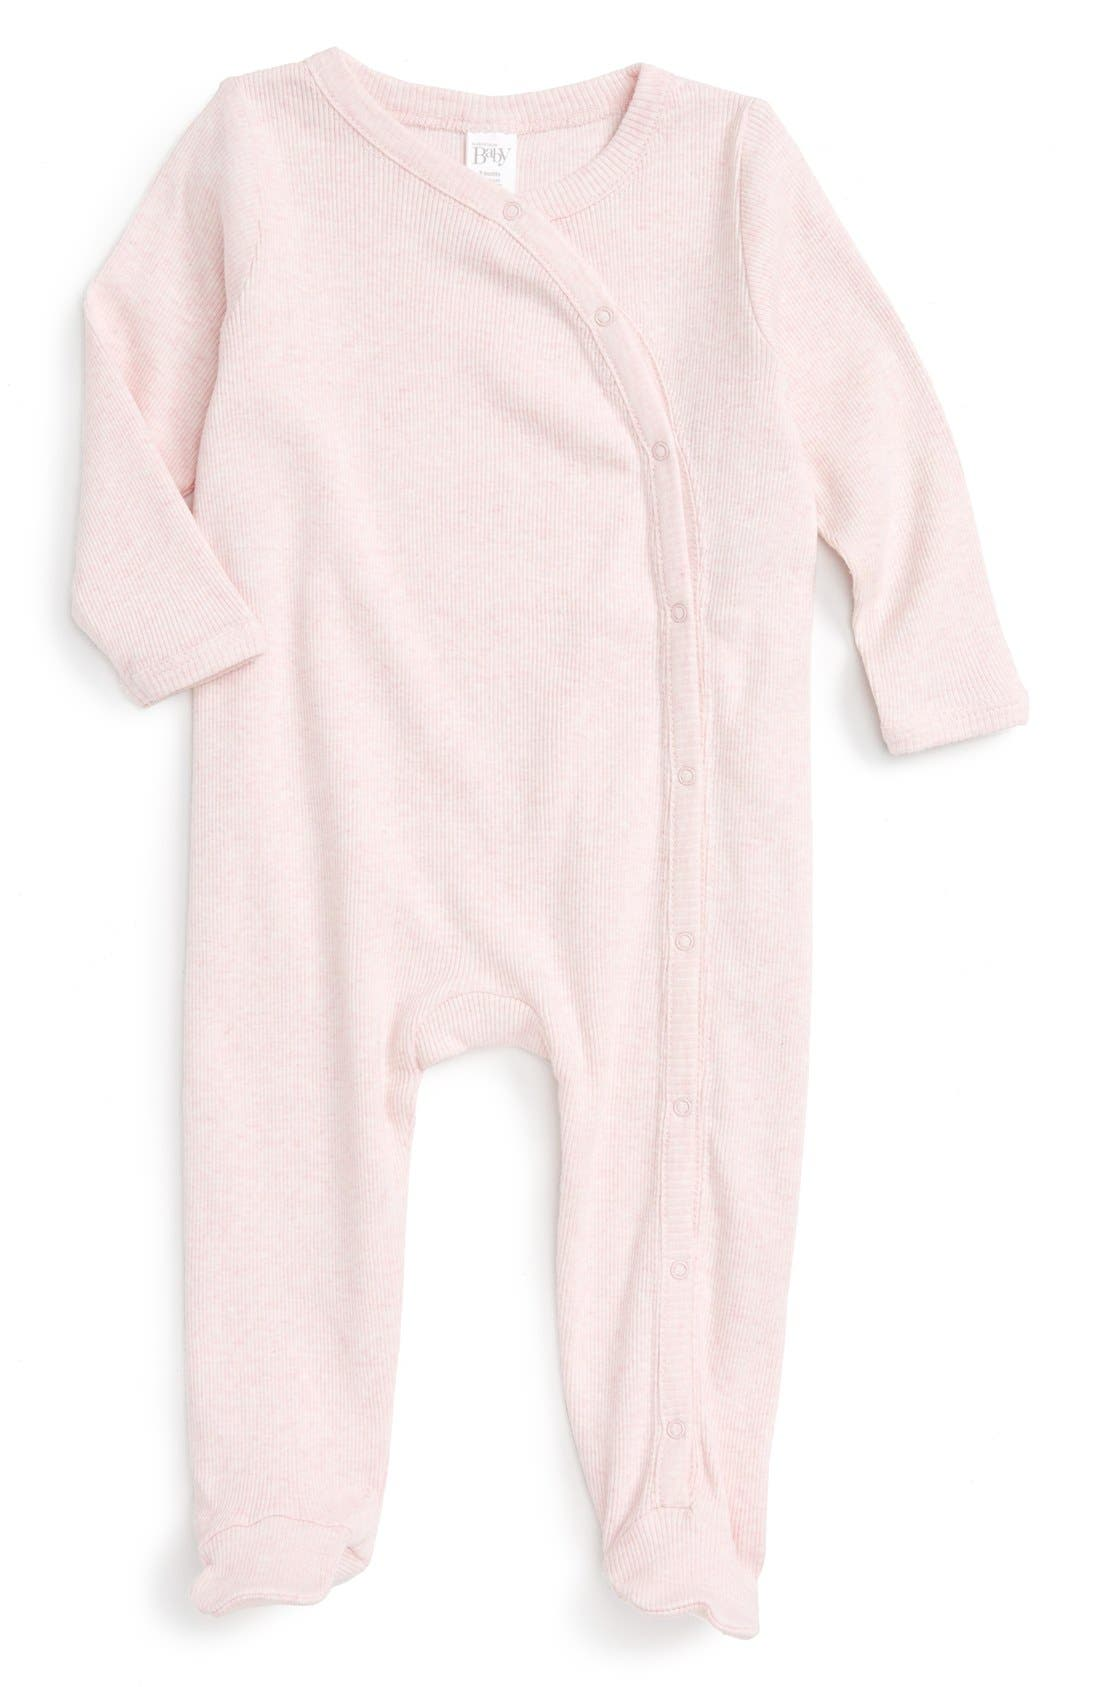 Nordstrom Baby Rib Knit Footie (Baby Girls)